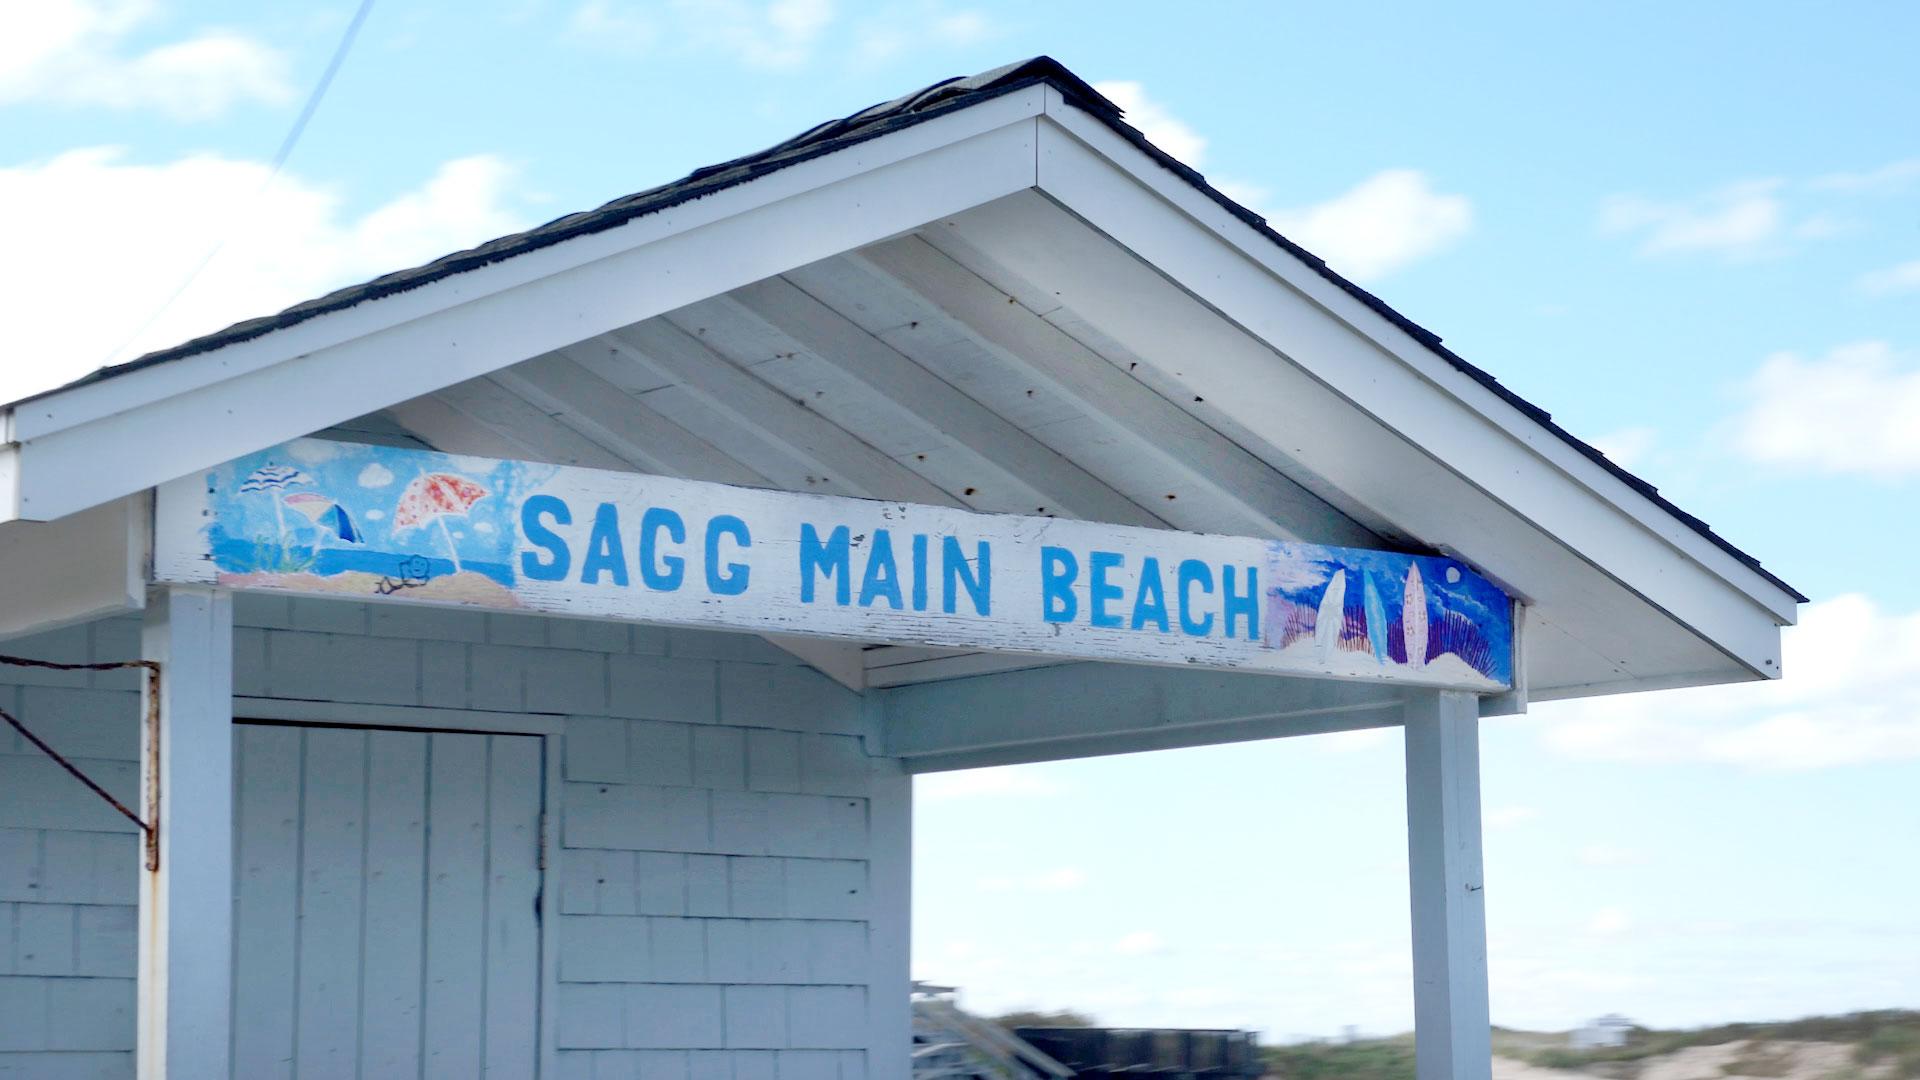 Sagg Main Beach on Long Island, New York